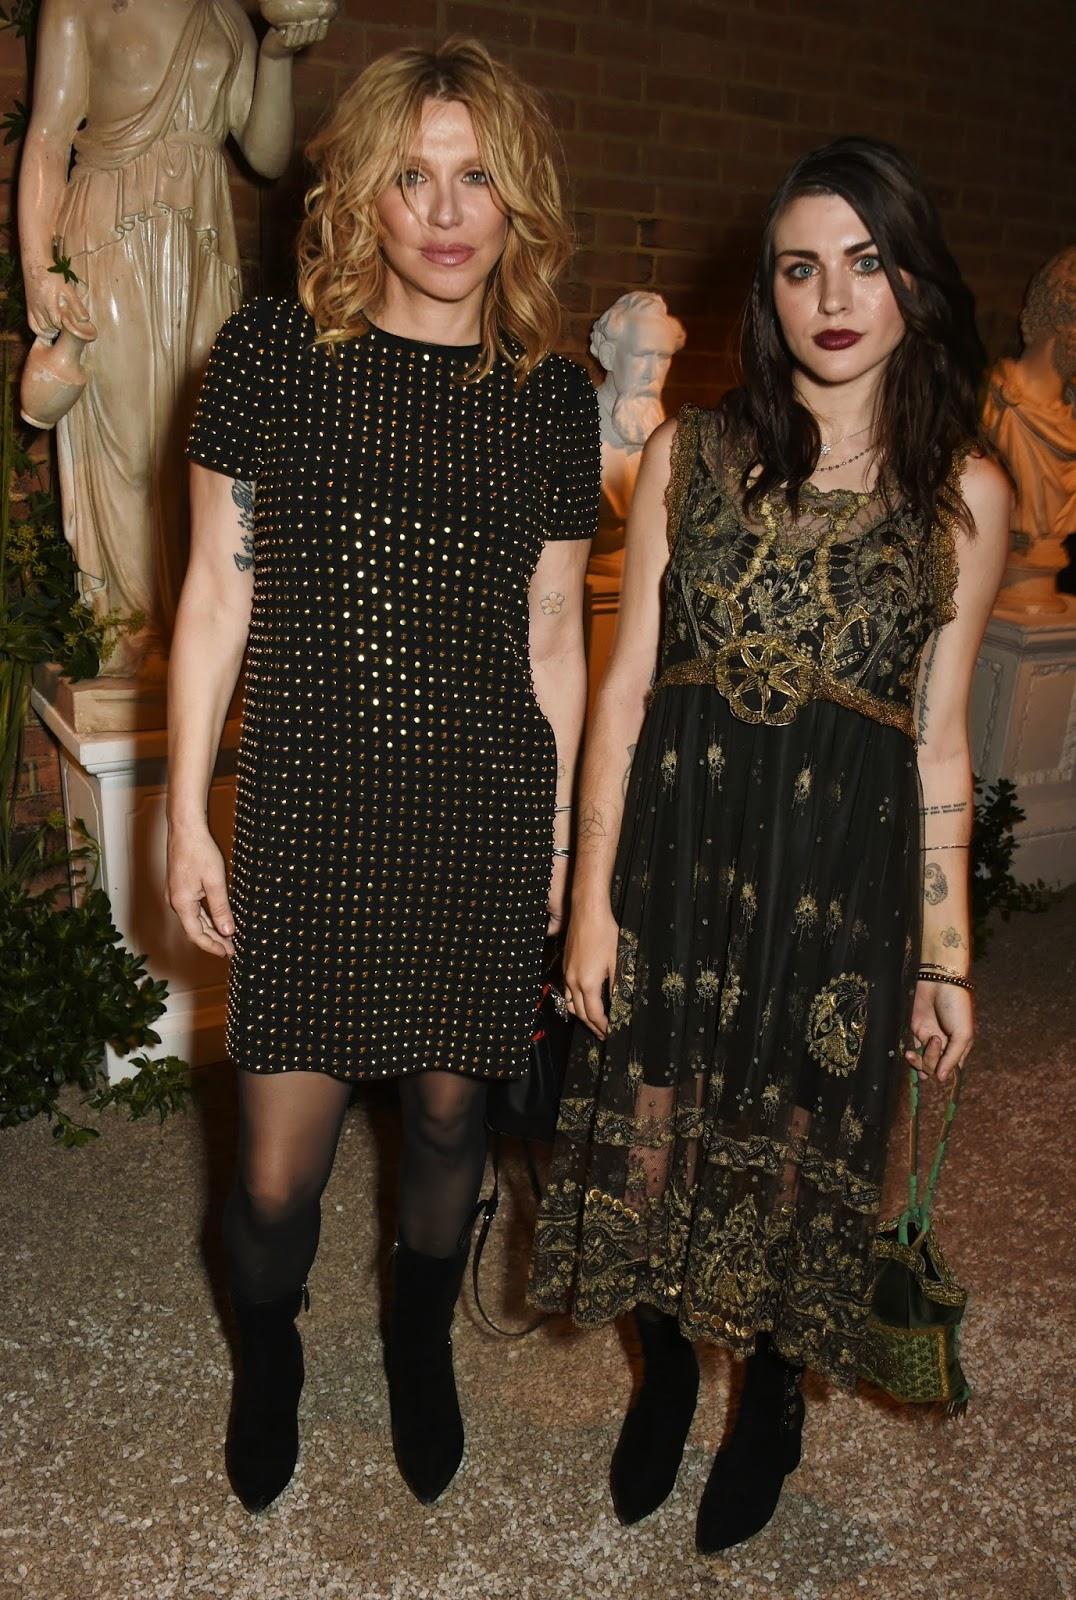 Azra Yates: Courtney Love & Daughter Frances Bean Cobain In